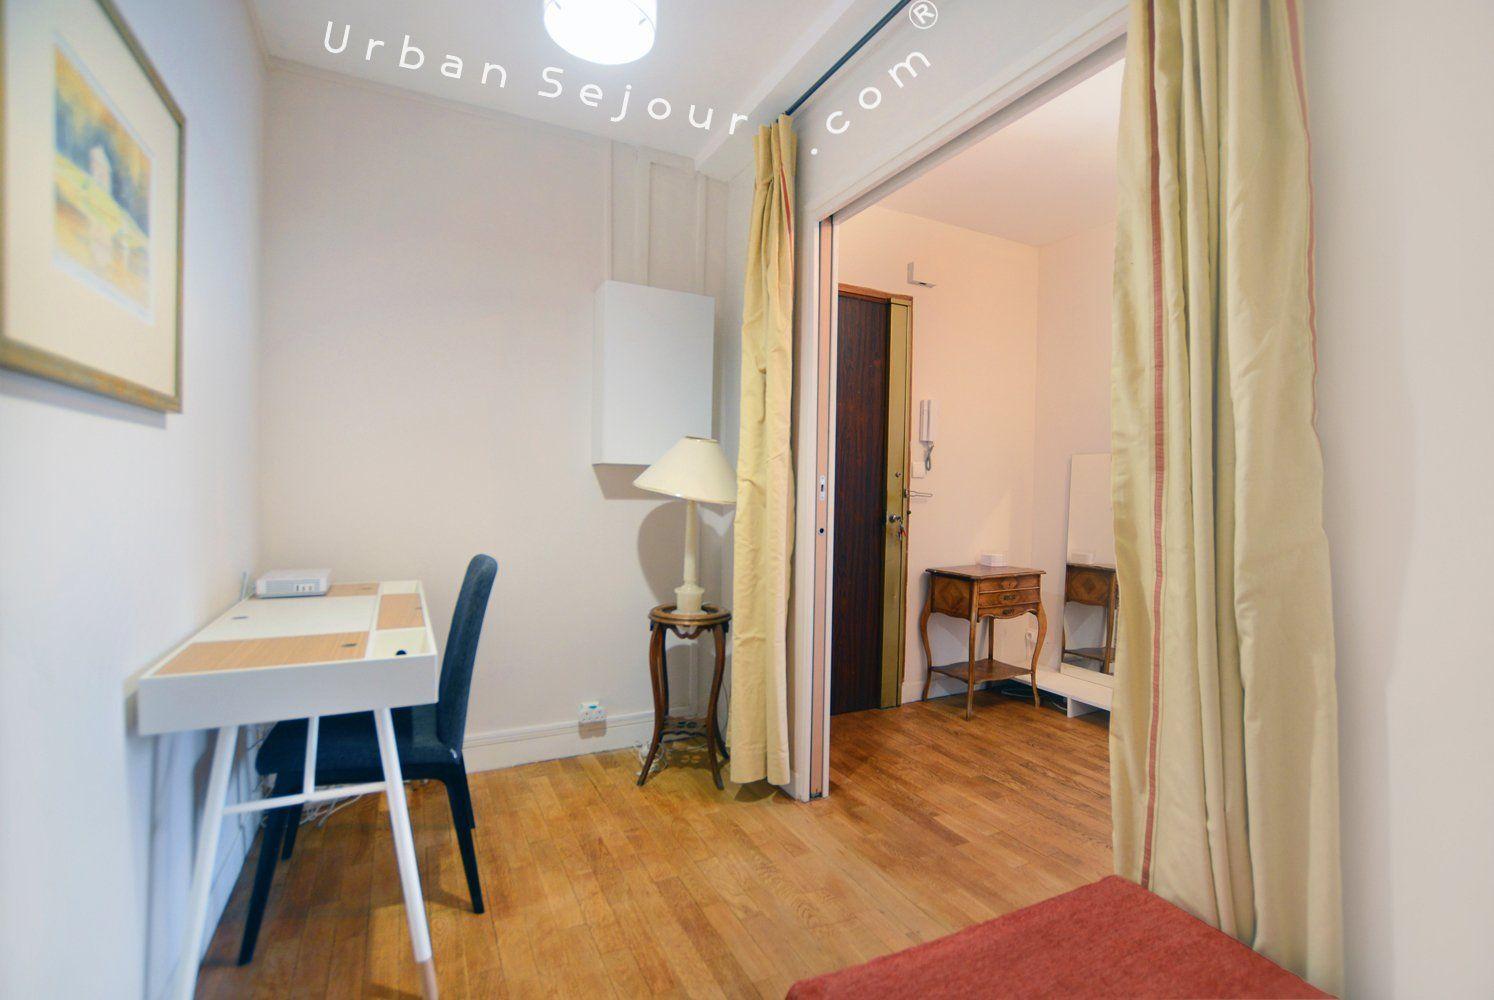 Location appartement meubl avec 2 chambres bureau ou for Location appartement avec chambre sans fenetre